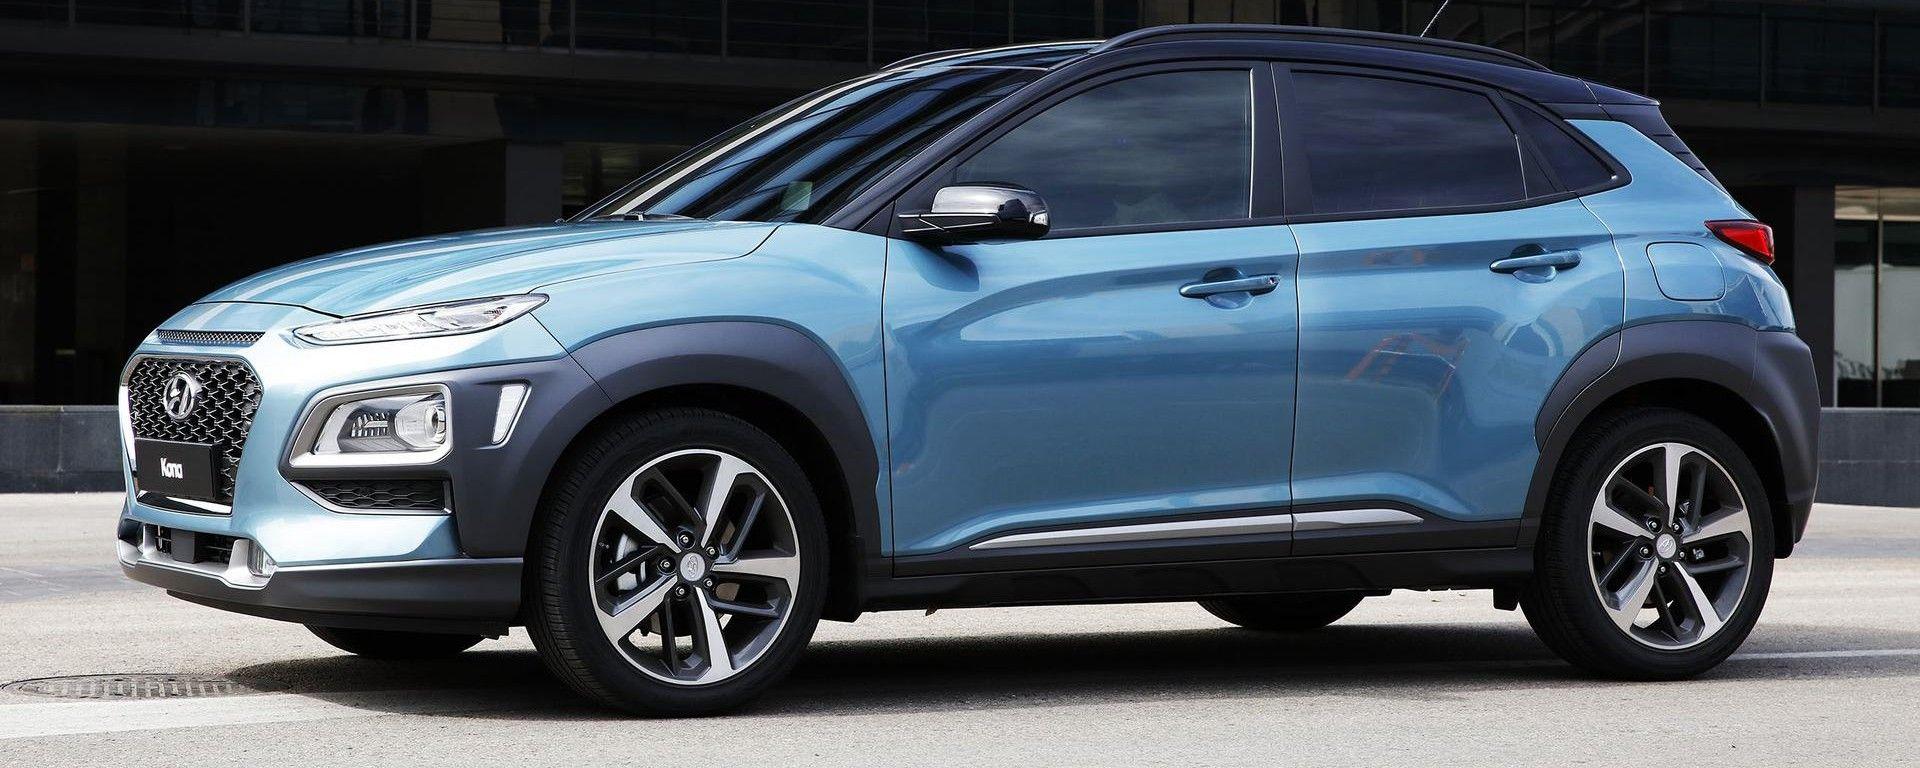 Nuova Hyundai Kona: offerta lancio fino al 31 dicembre